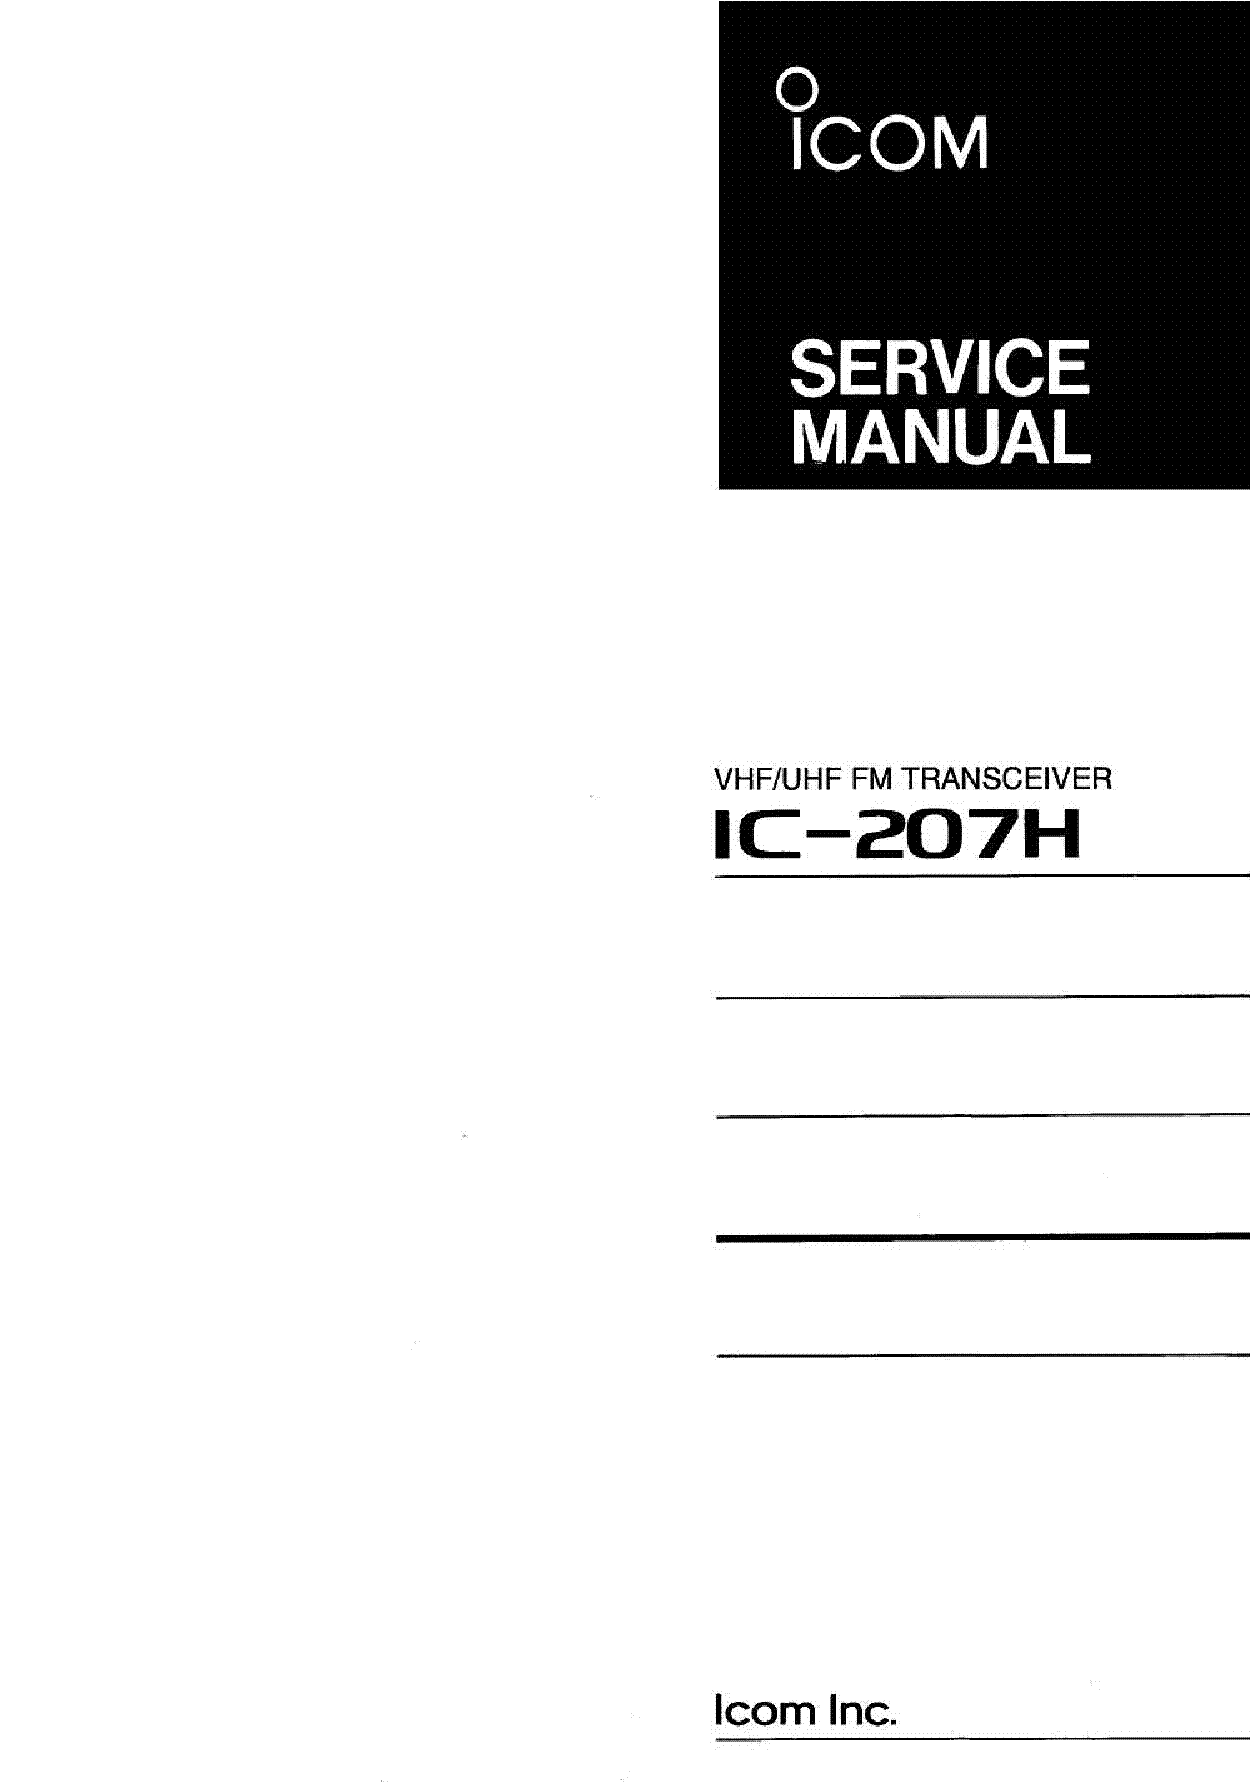 sharp 14r2 инструкция